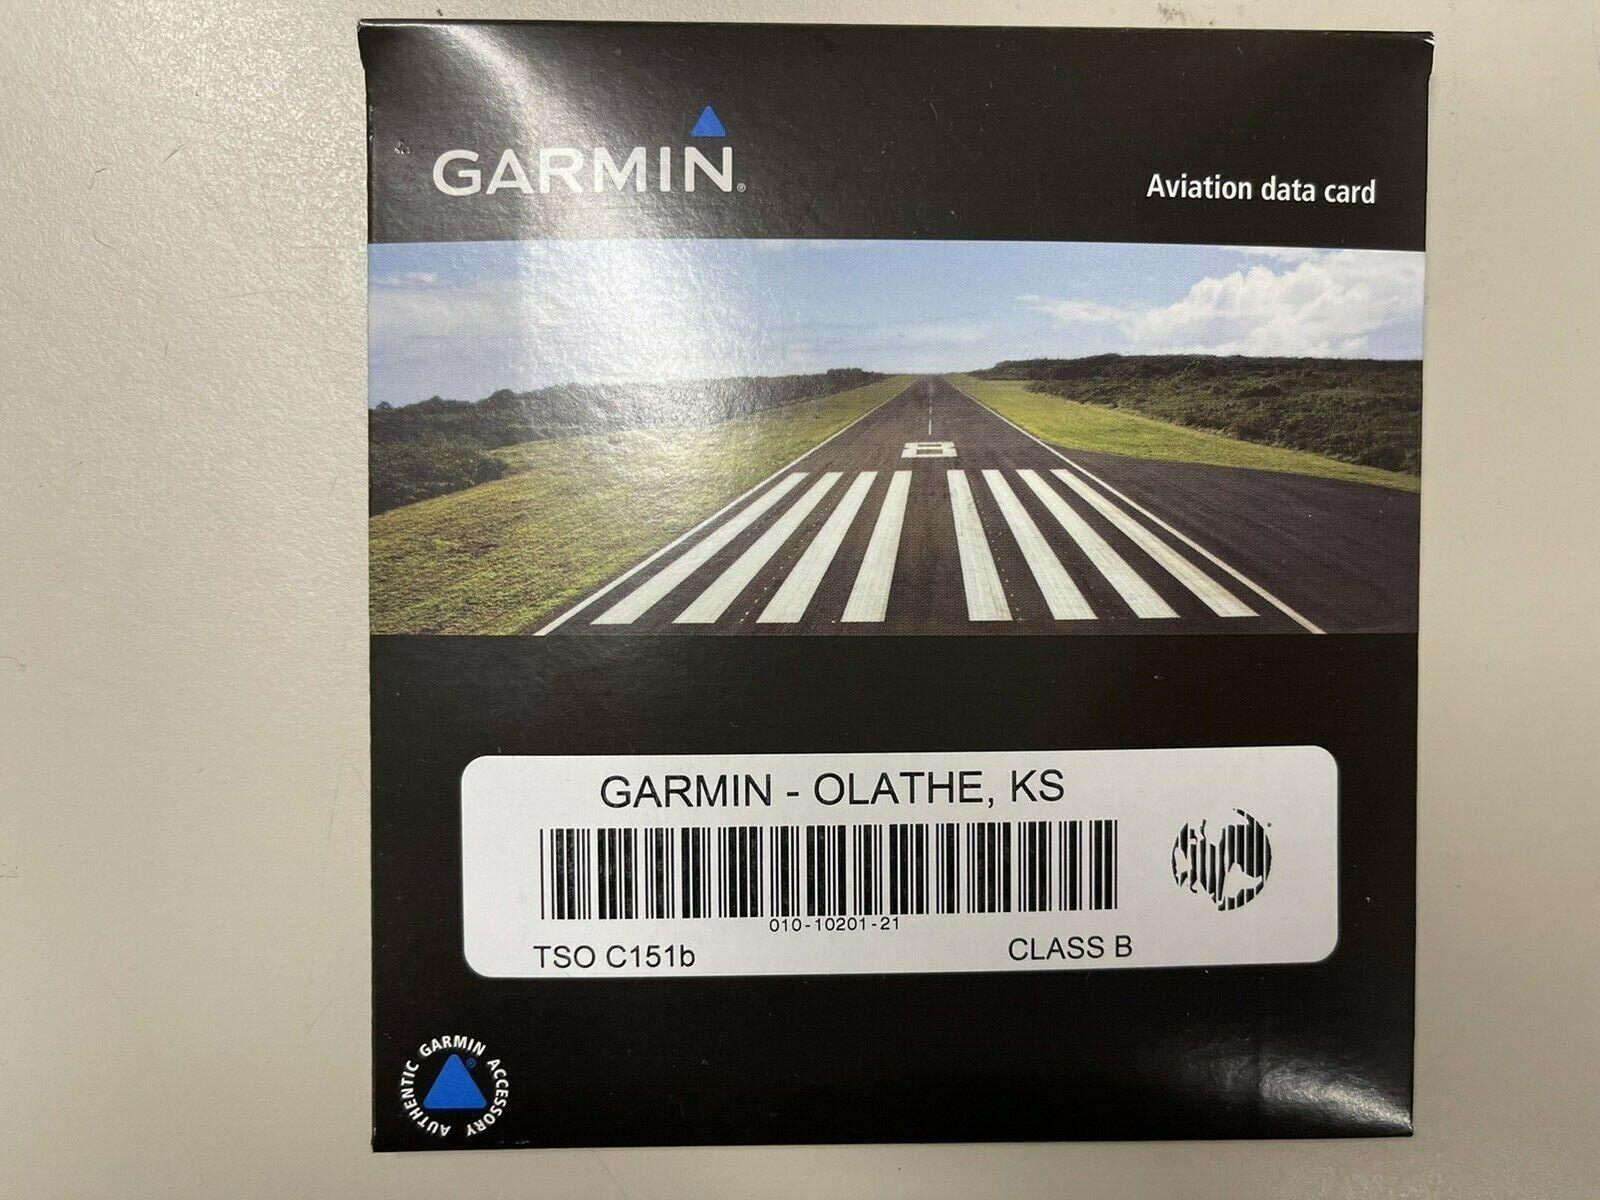 Garmin GNS 430W/530W WAAS Terrain Card